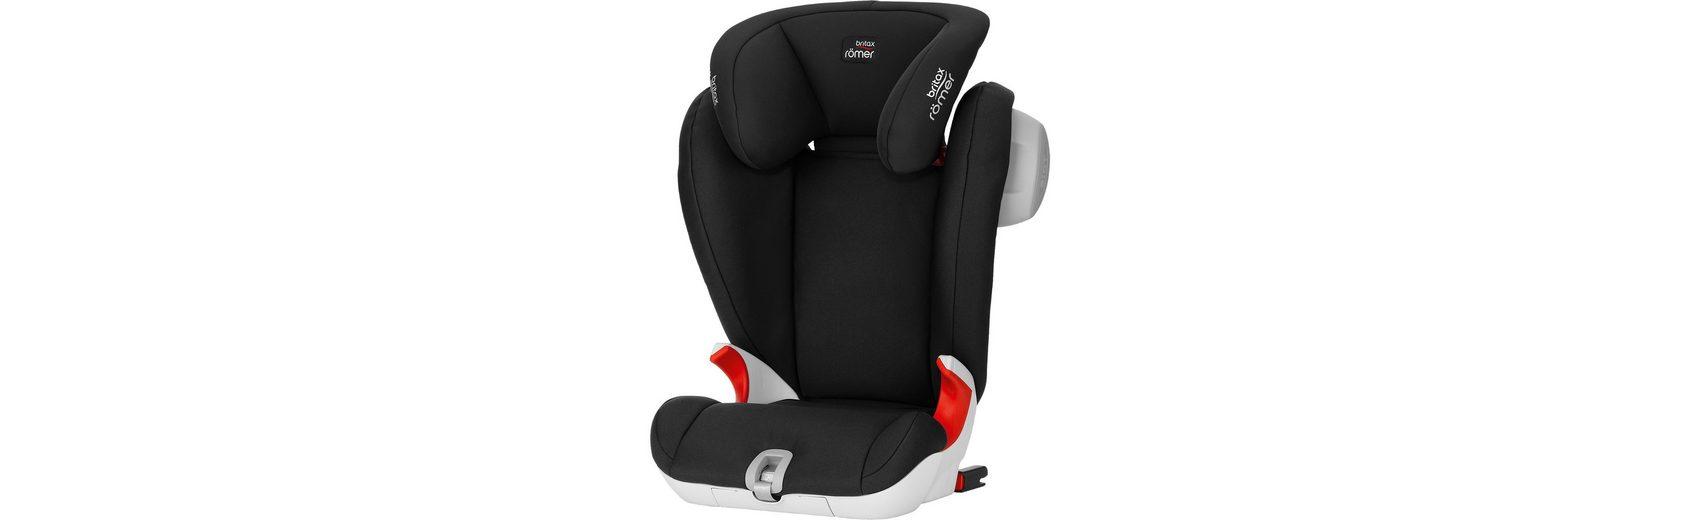 Britax Römer Auto-Kindersitz Kidfix SL Sict, Cosmos Black, 2016